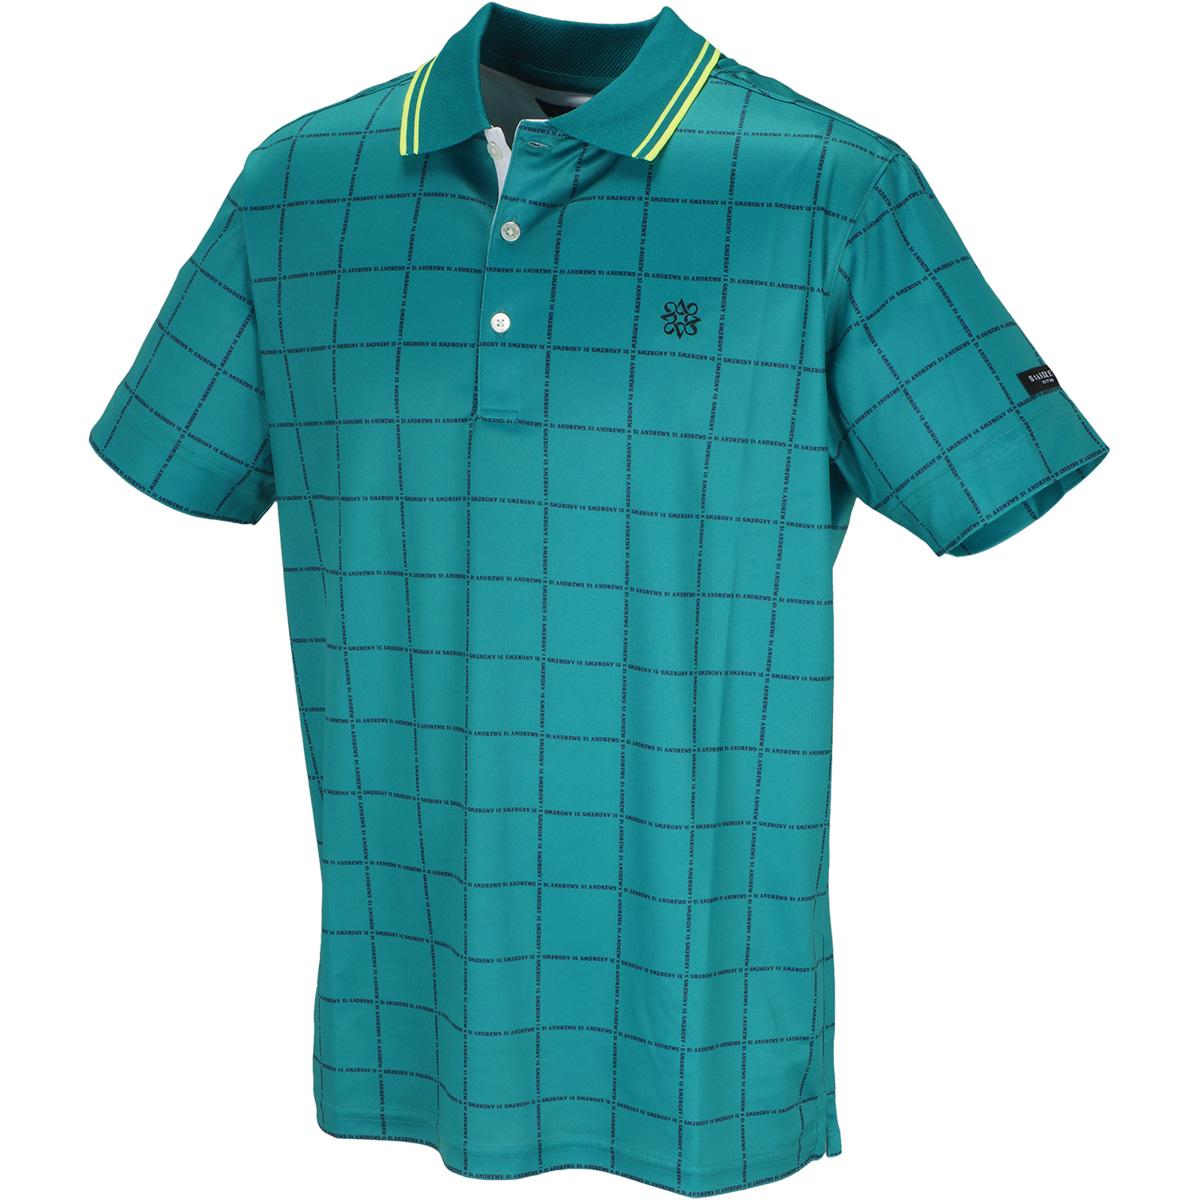 COOLMAX 鹿の子ウインドペンロゴプリント 半袖ポロシャツ